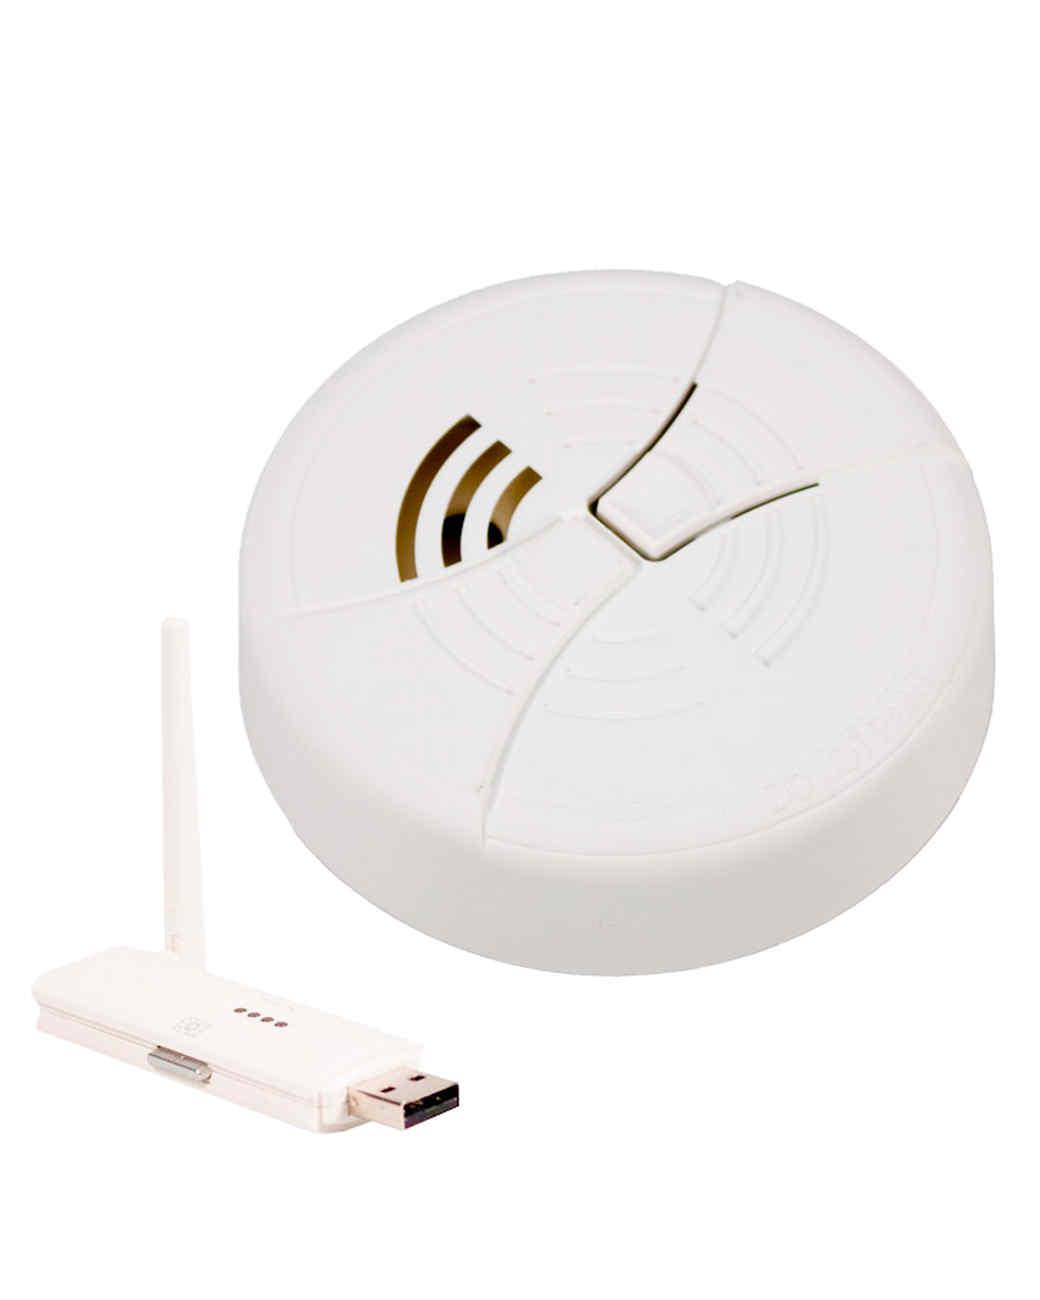 kjb-digital-wireless-smoke-detector.jpg